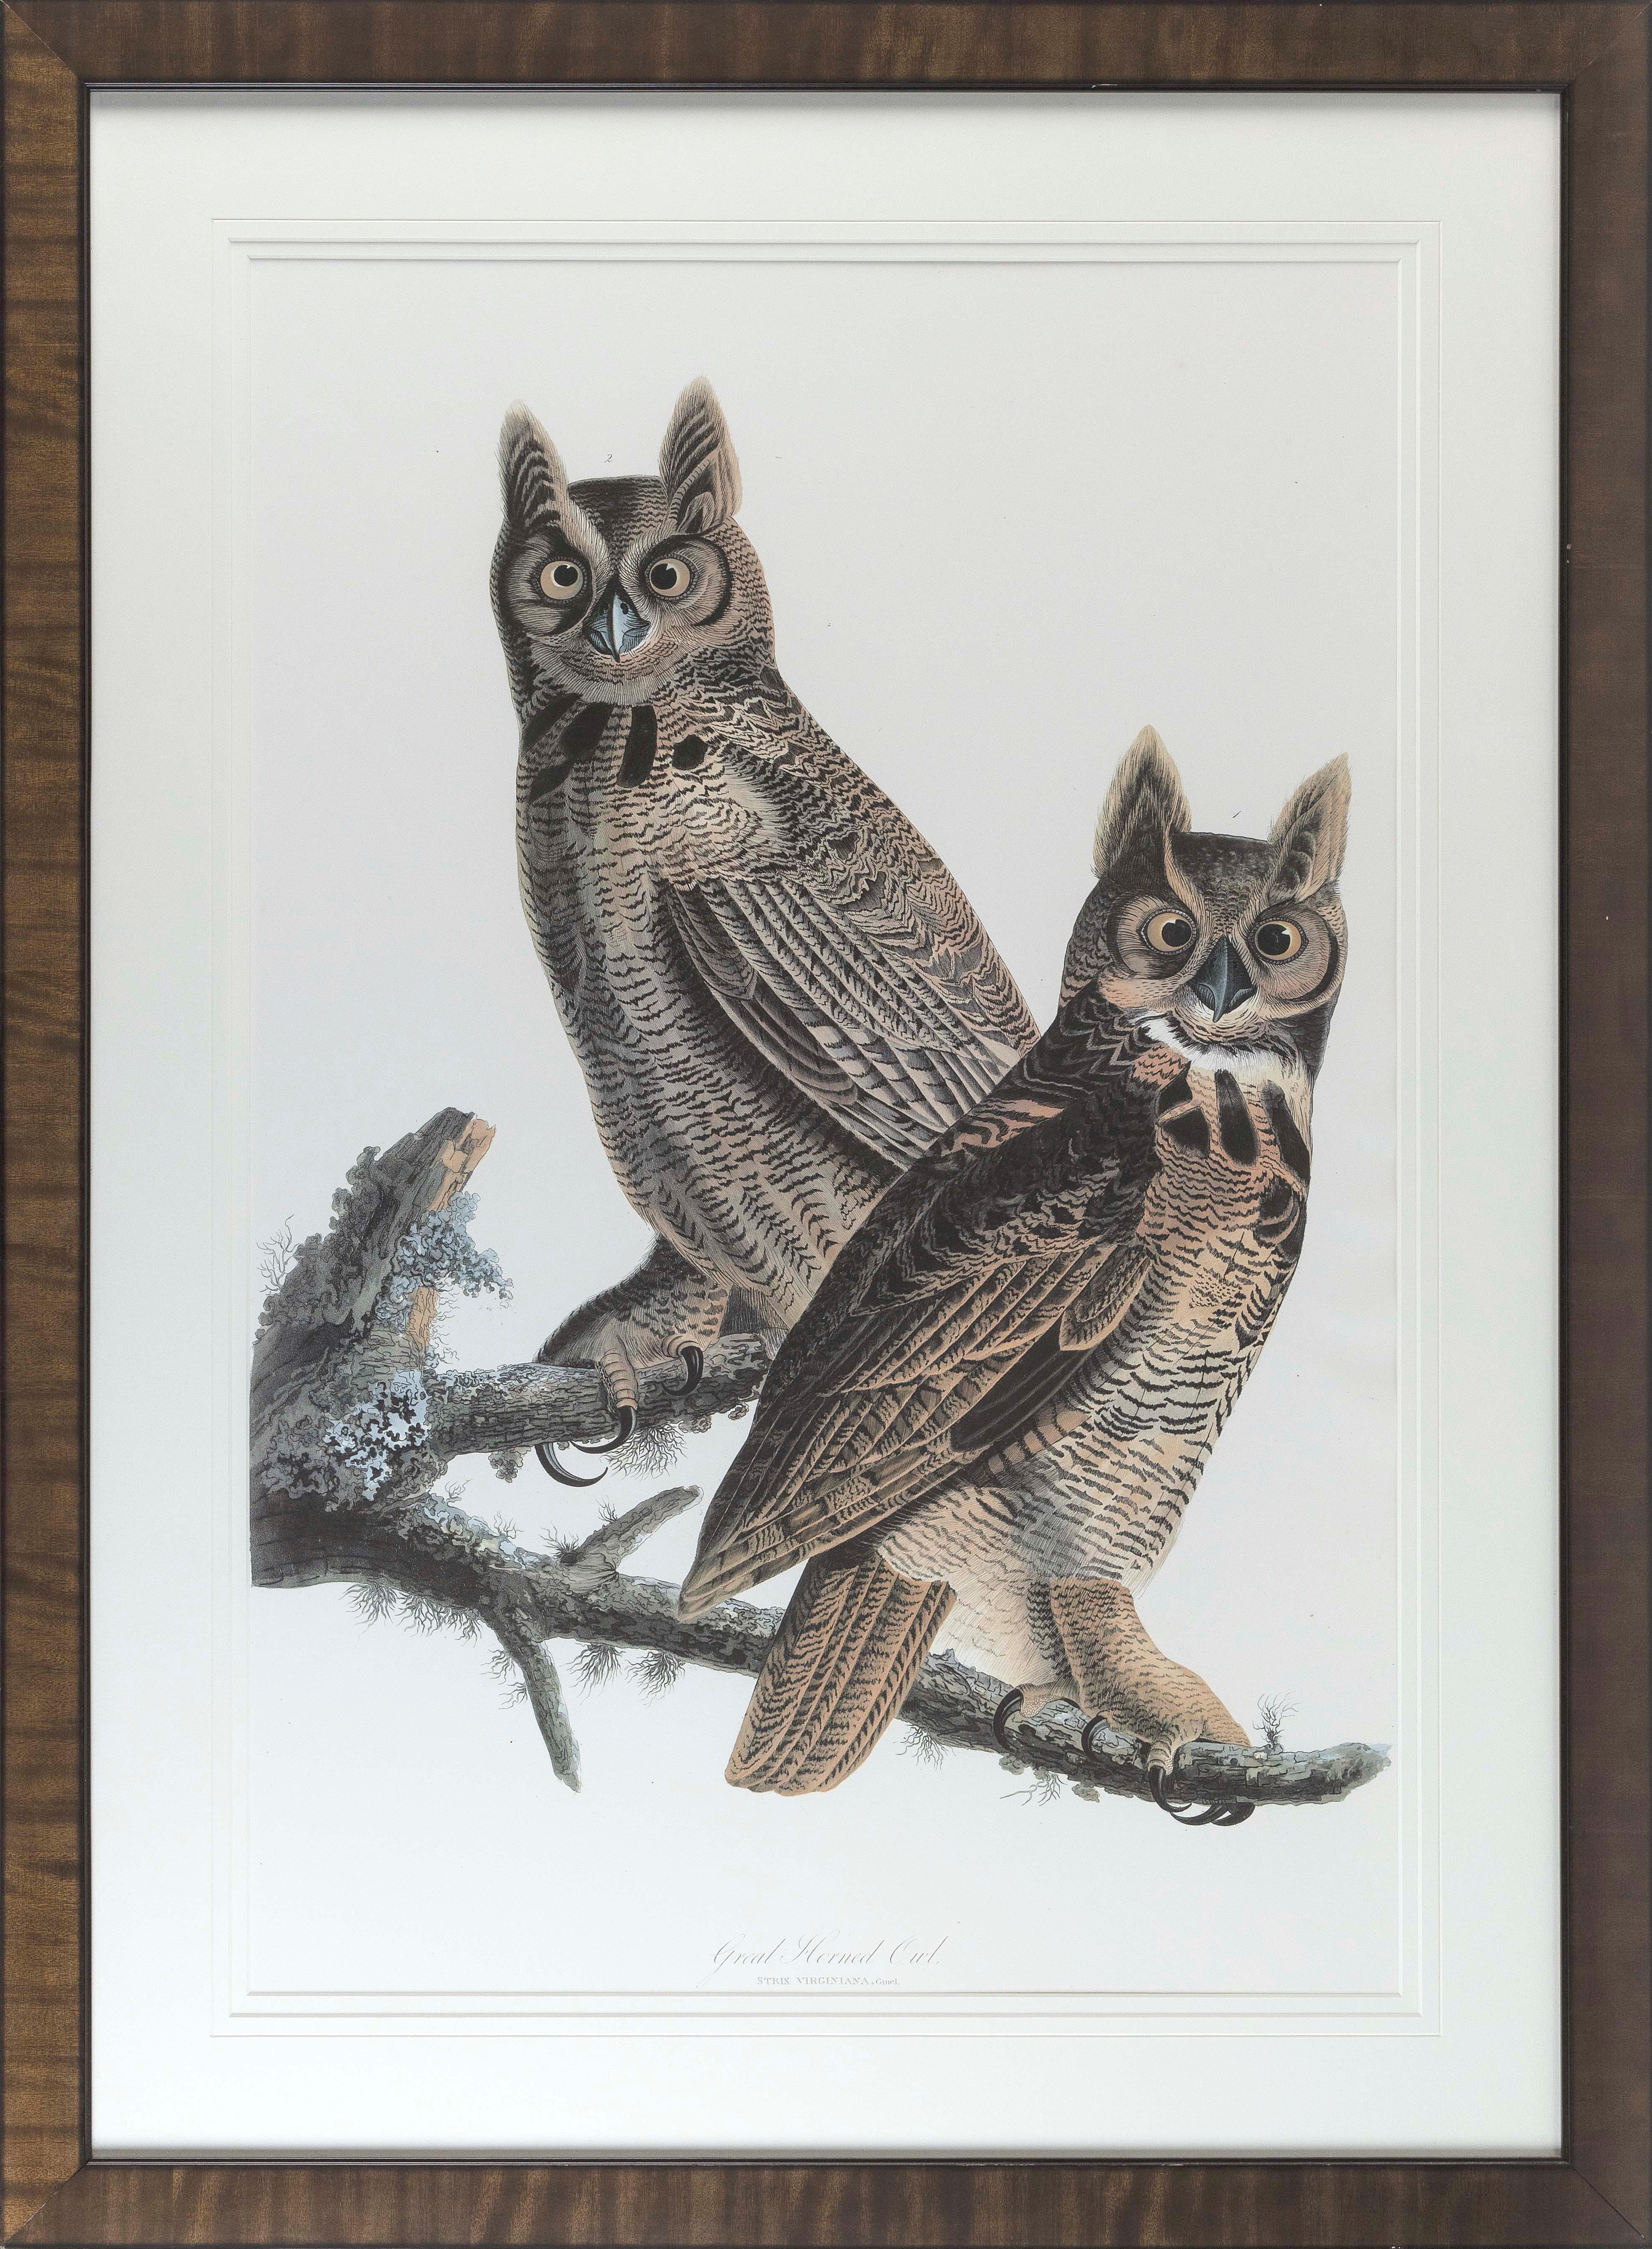 "AUDUBON SOCIETY/ABBEVILLE PRESS PRINT ""GREAT HORNED OWL"" Circa 1985 Full-size facsimile of an original Audubon plate, 35.5"" x 23.5"" sight. Framed 46.5"" x 35""."